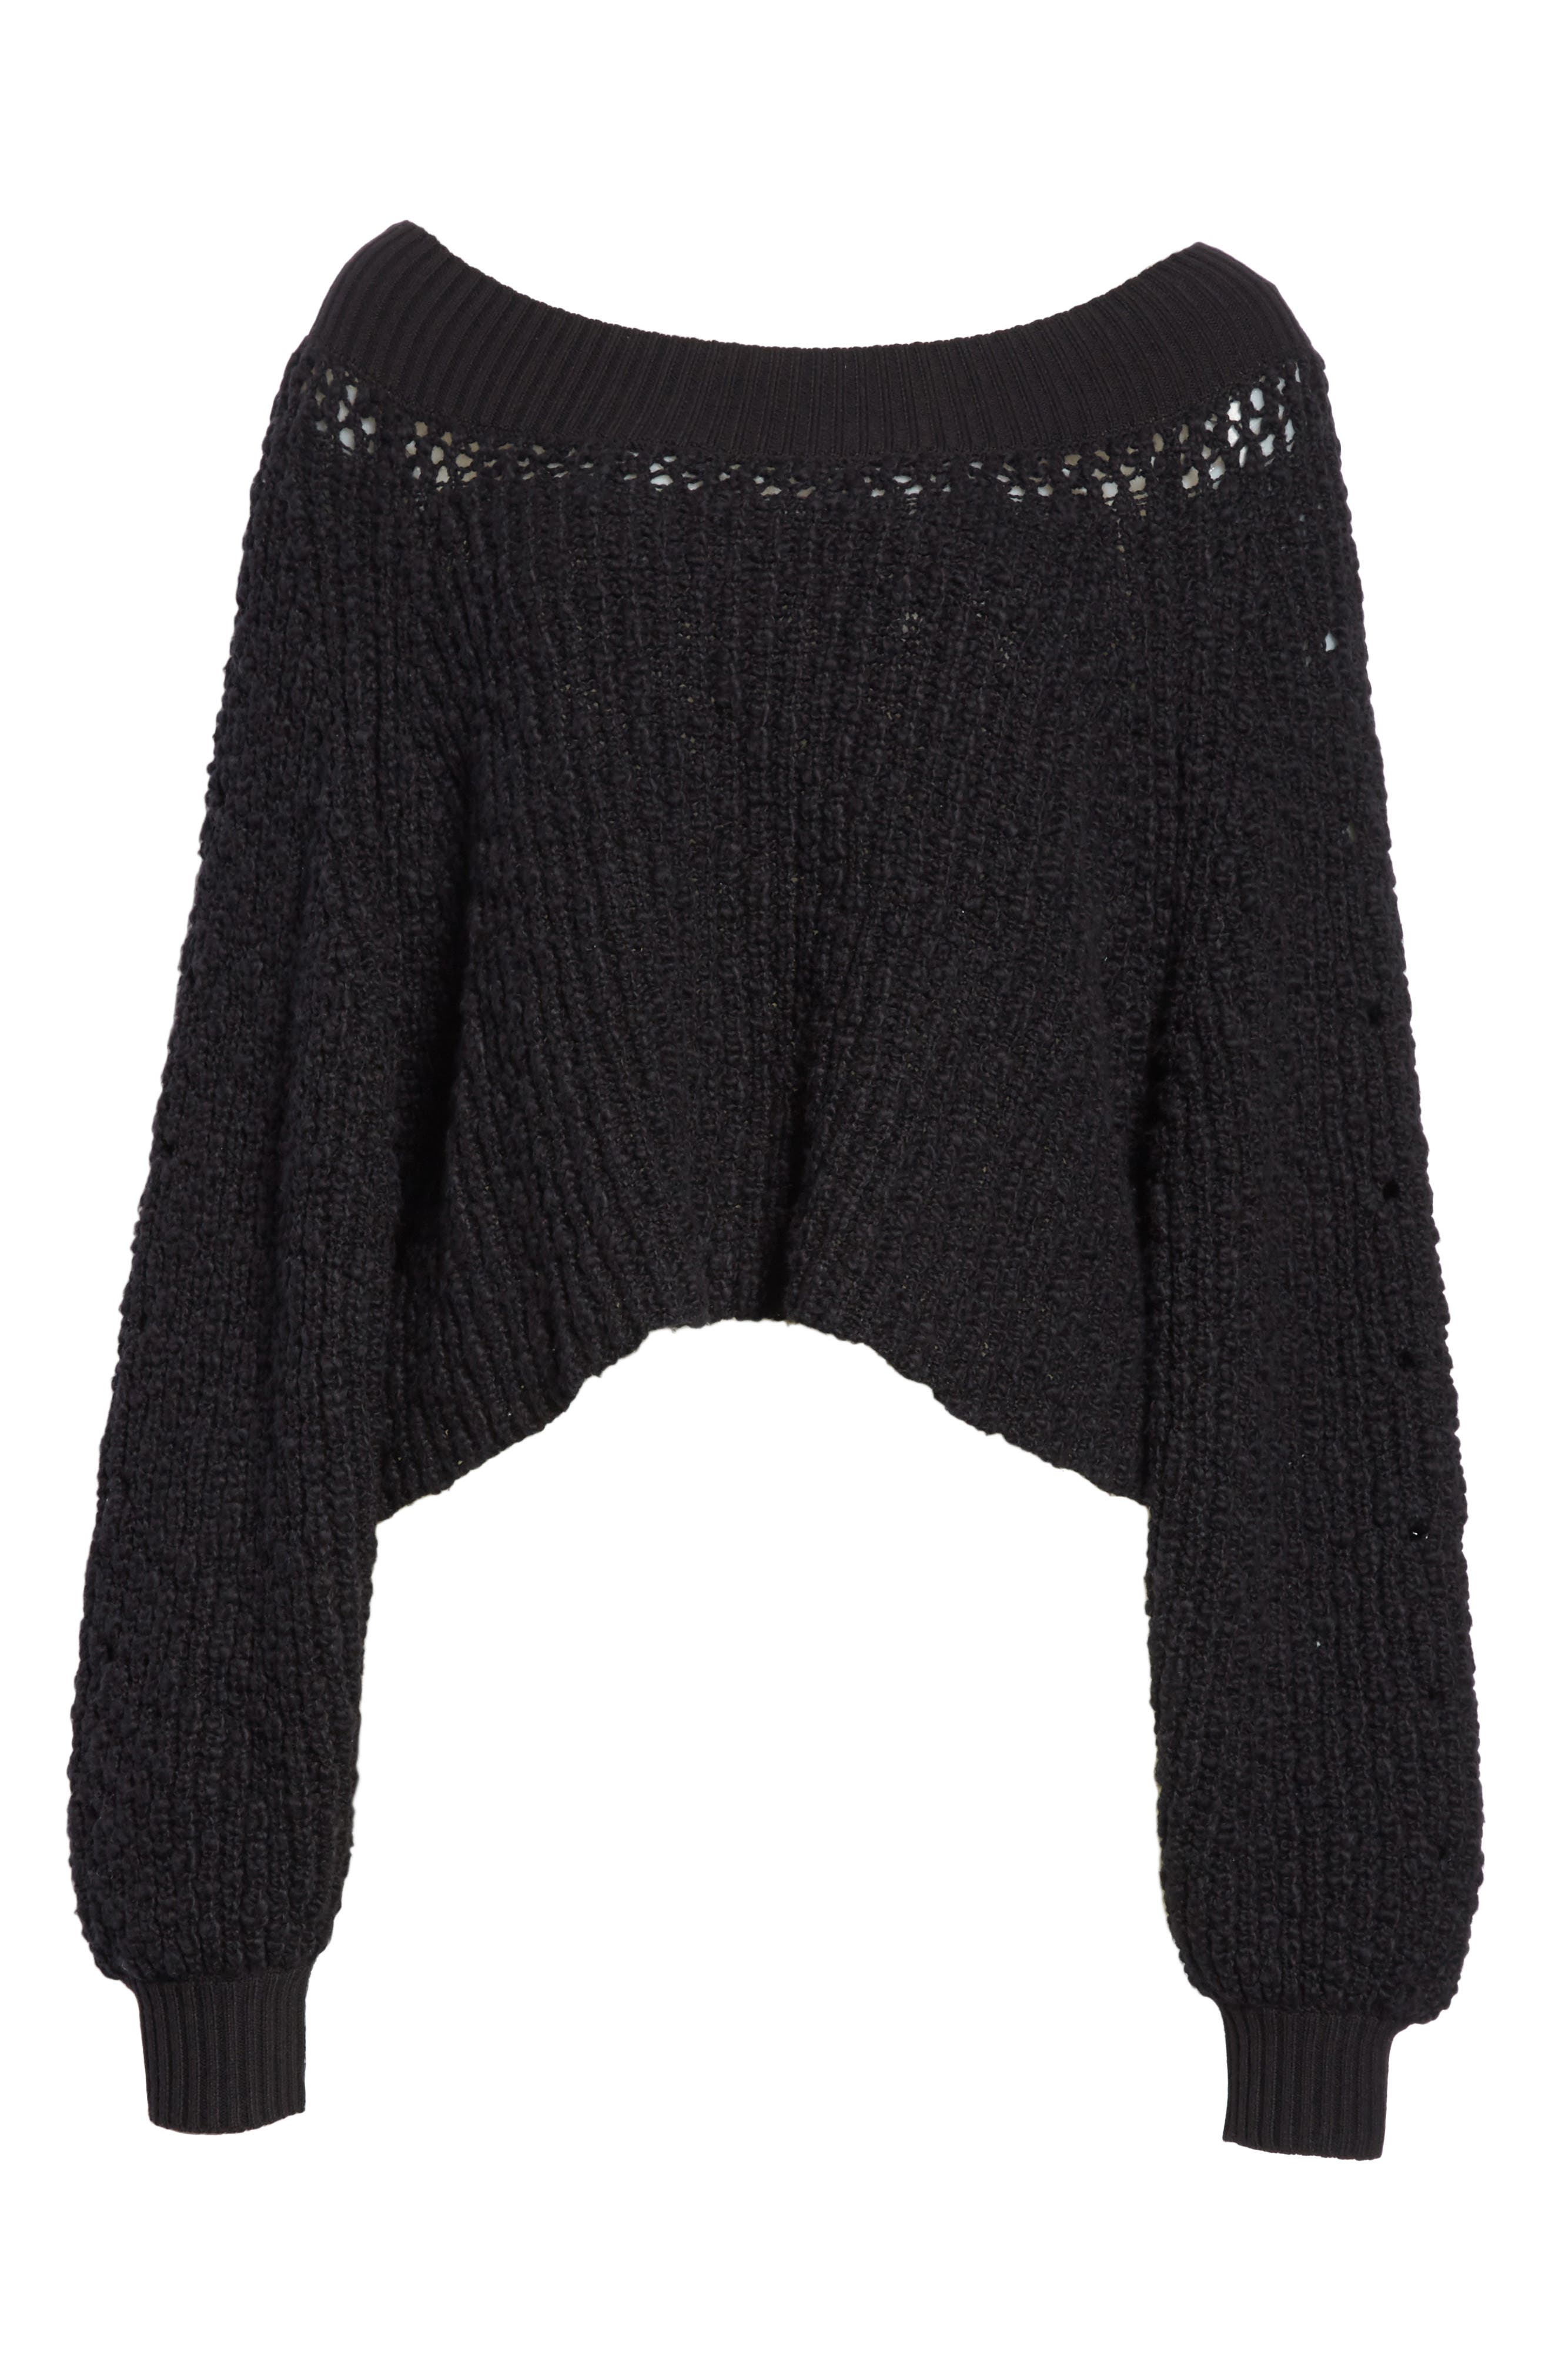 Pandora's Boatneck Sweater,                             Alternate thumbnail 7, color,                             Black